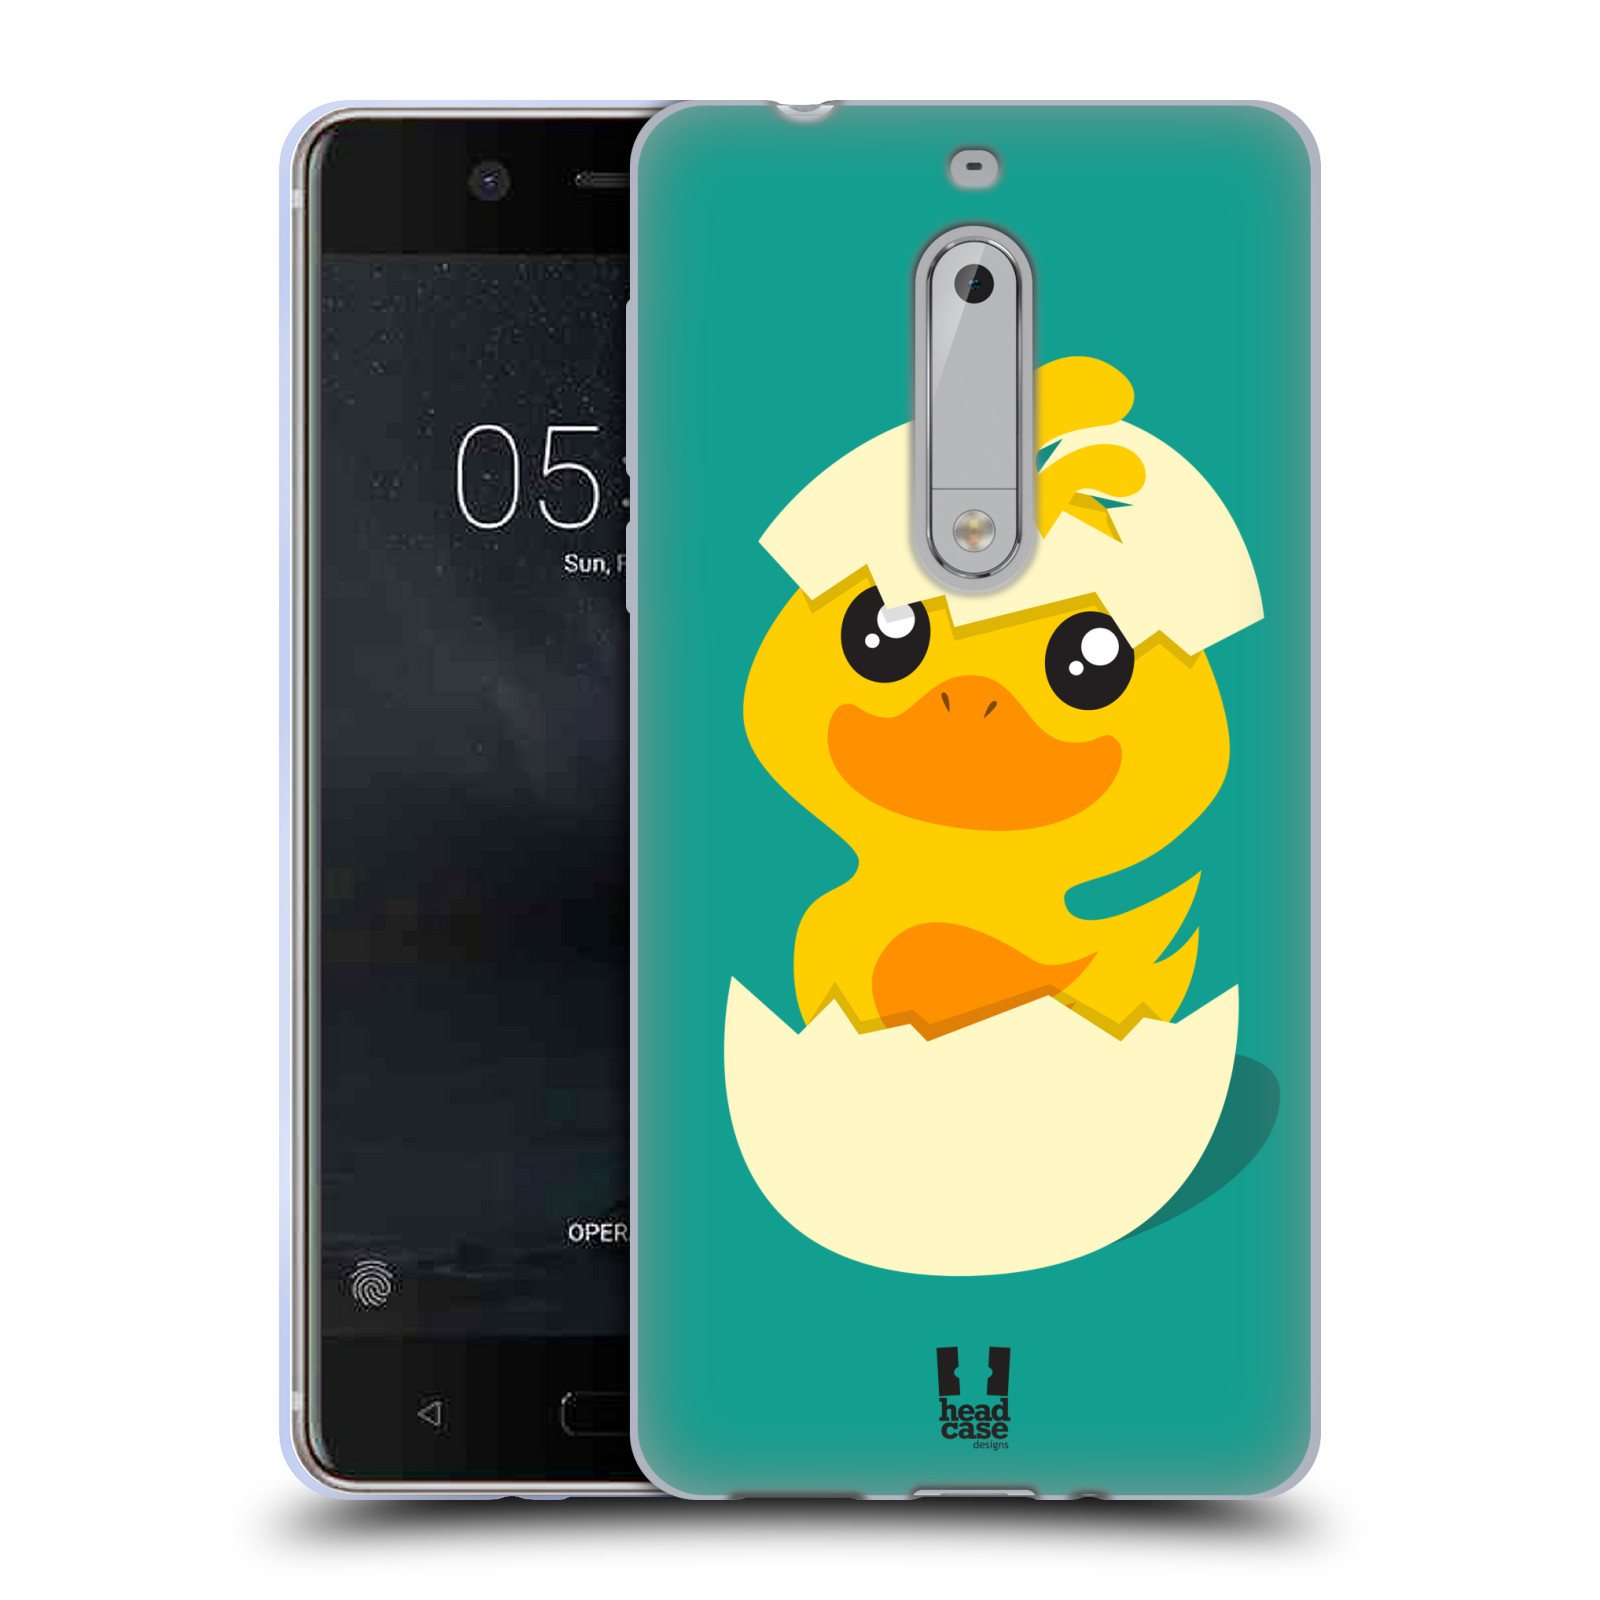 Silikonové pouzdro na mobil Nokia 5 Head Case - KACHNIČKA Z VAJÍČKA (Silikonový kryt či obal na mobilní telefon Nokia 5 (2017))